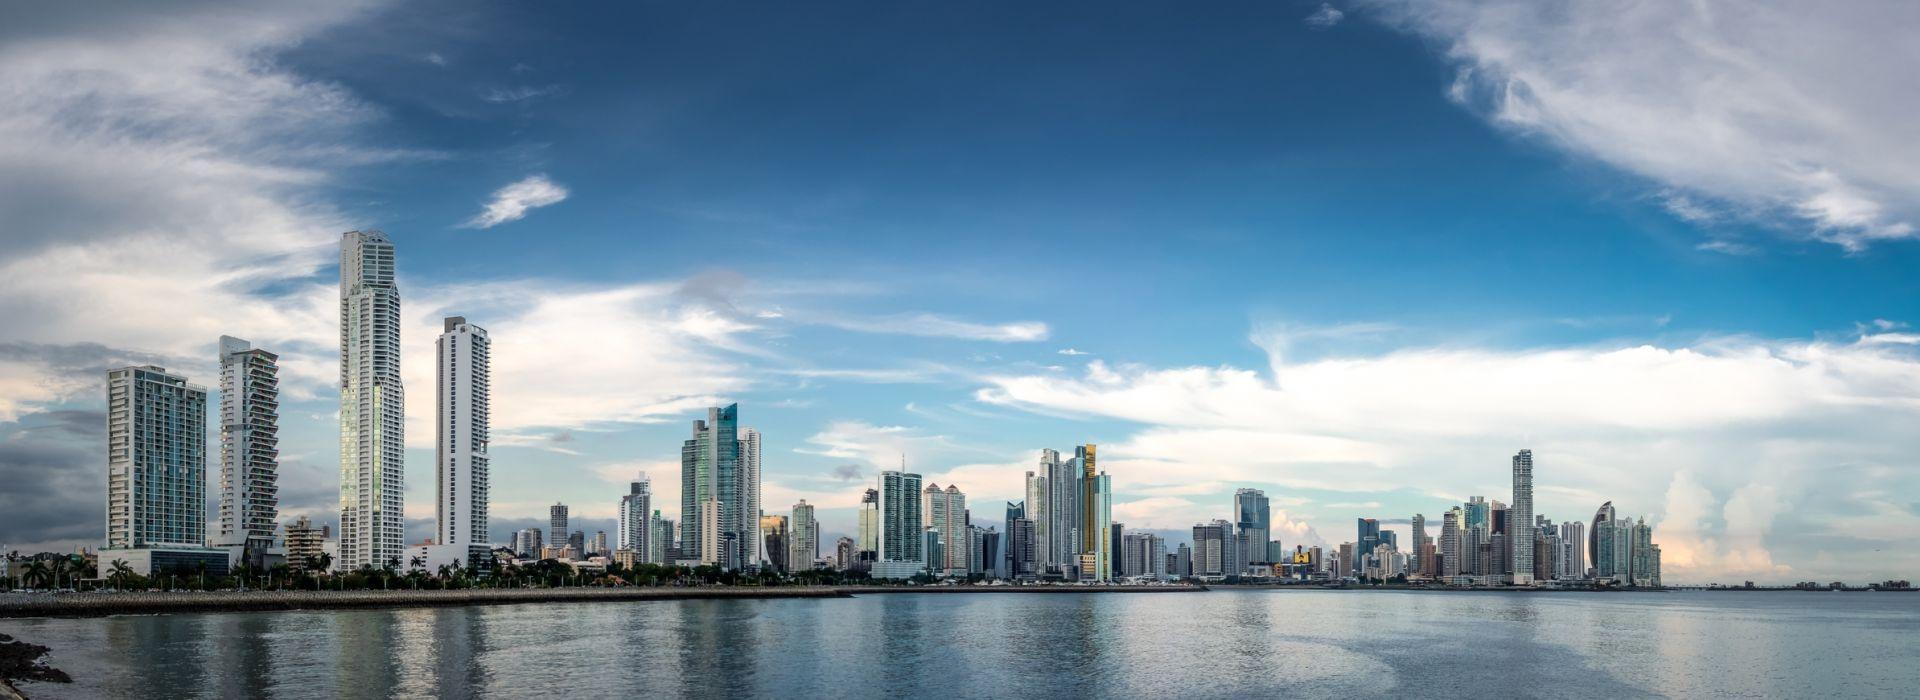 Costa Rica & Panama Tours